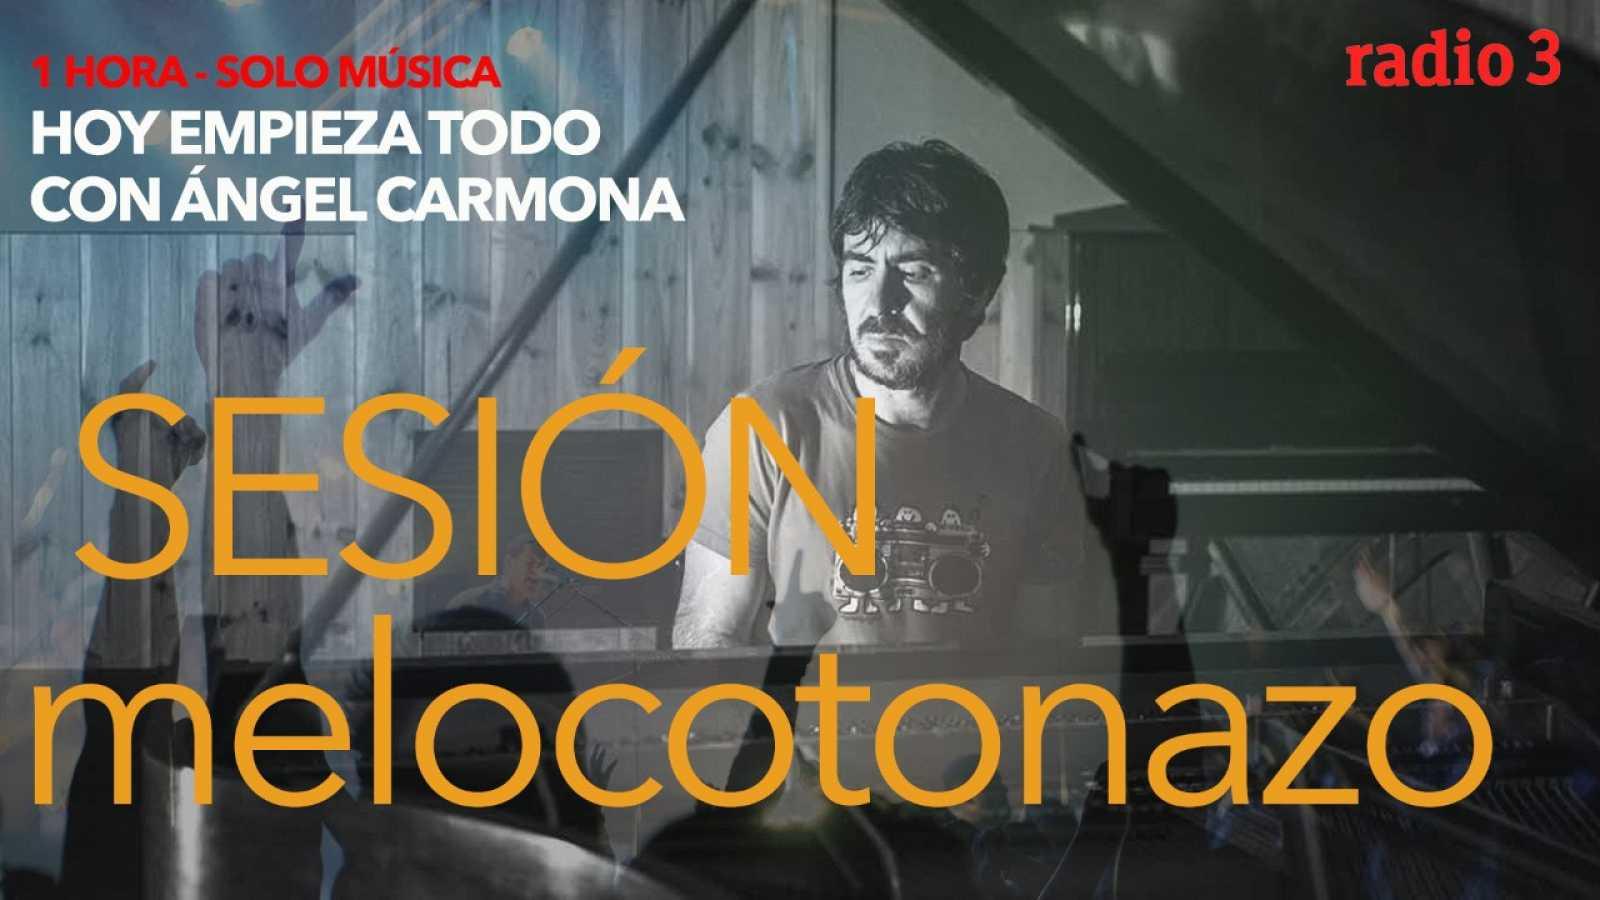 Hoy empieza todo con Ángel Carmona - #SesiónMelocotonazo: John Oates, Luis Prado, Señor Mostaza... - 07/04/21 - escuchar ahora